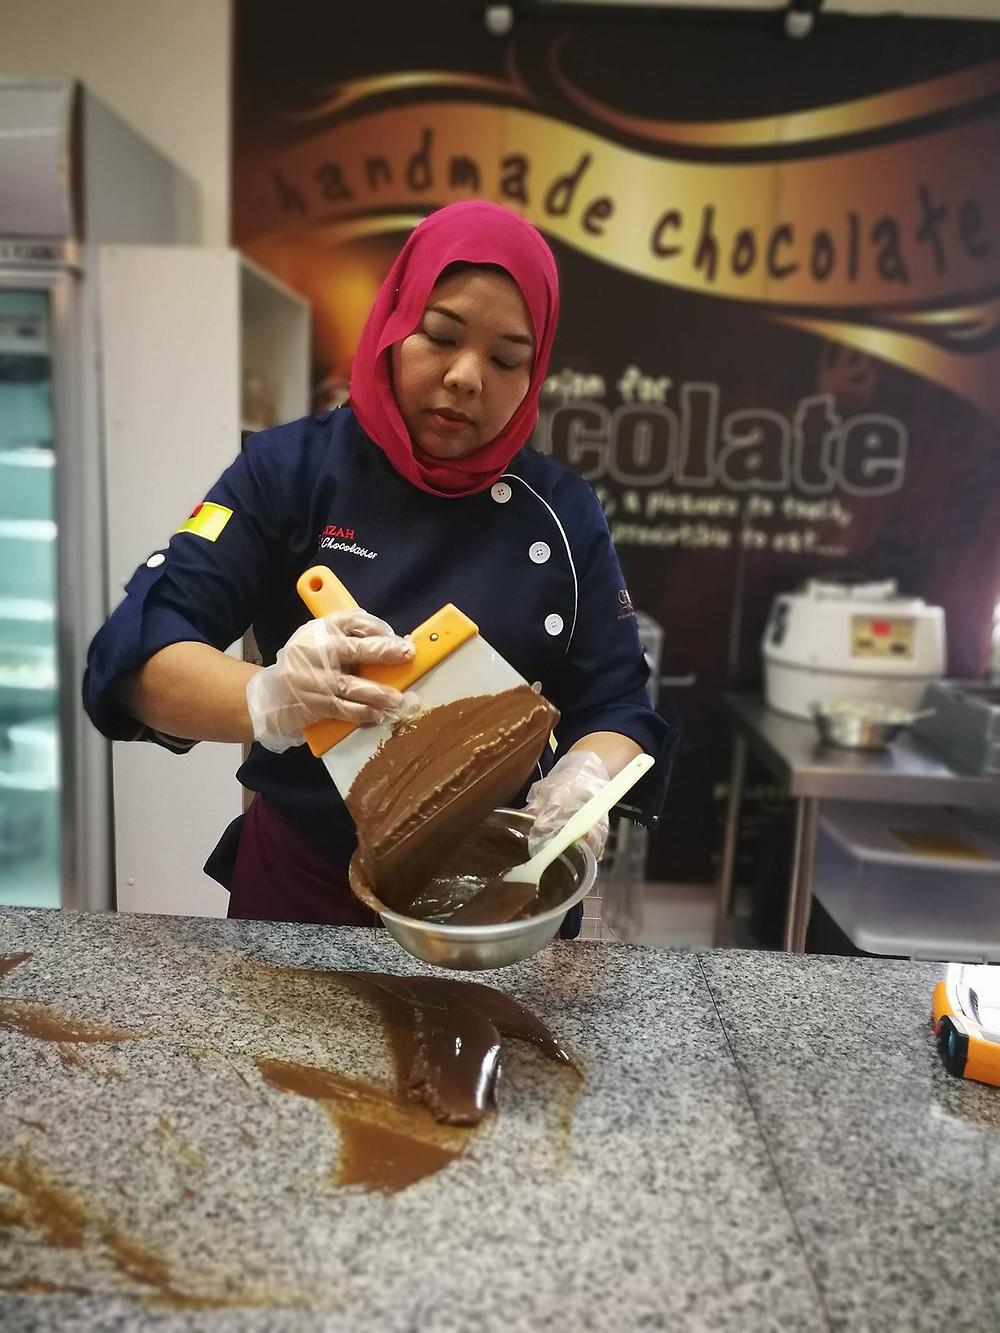 serembanonline photograph of Chocsvalley chocolate and Siti Kassim by nicaliss photographer Nic Falconer